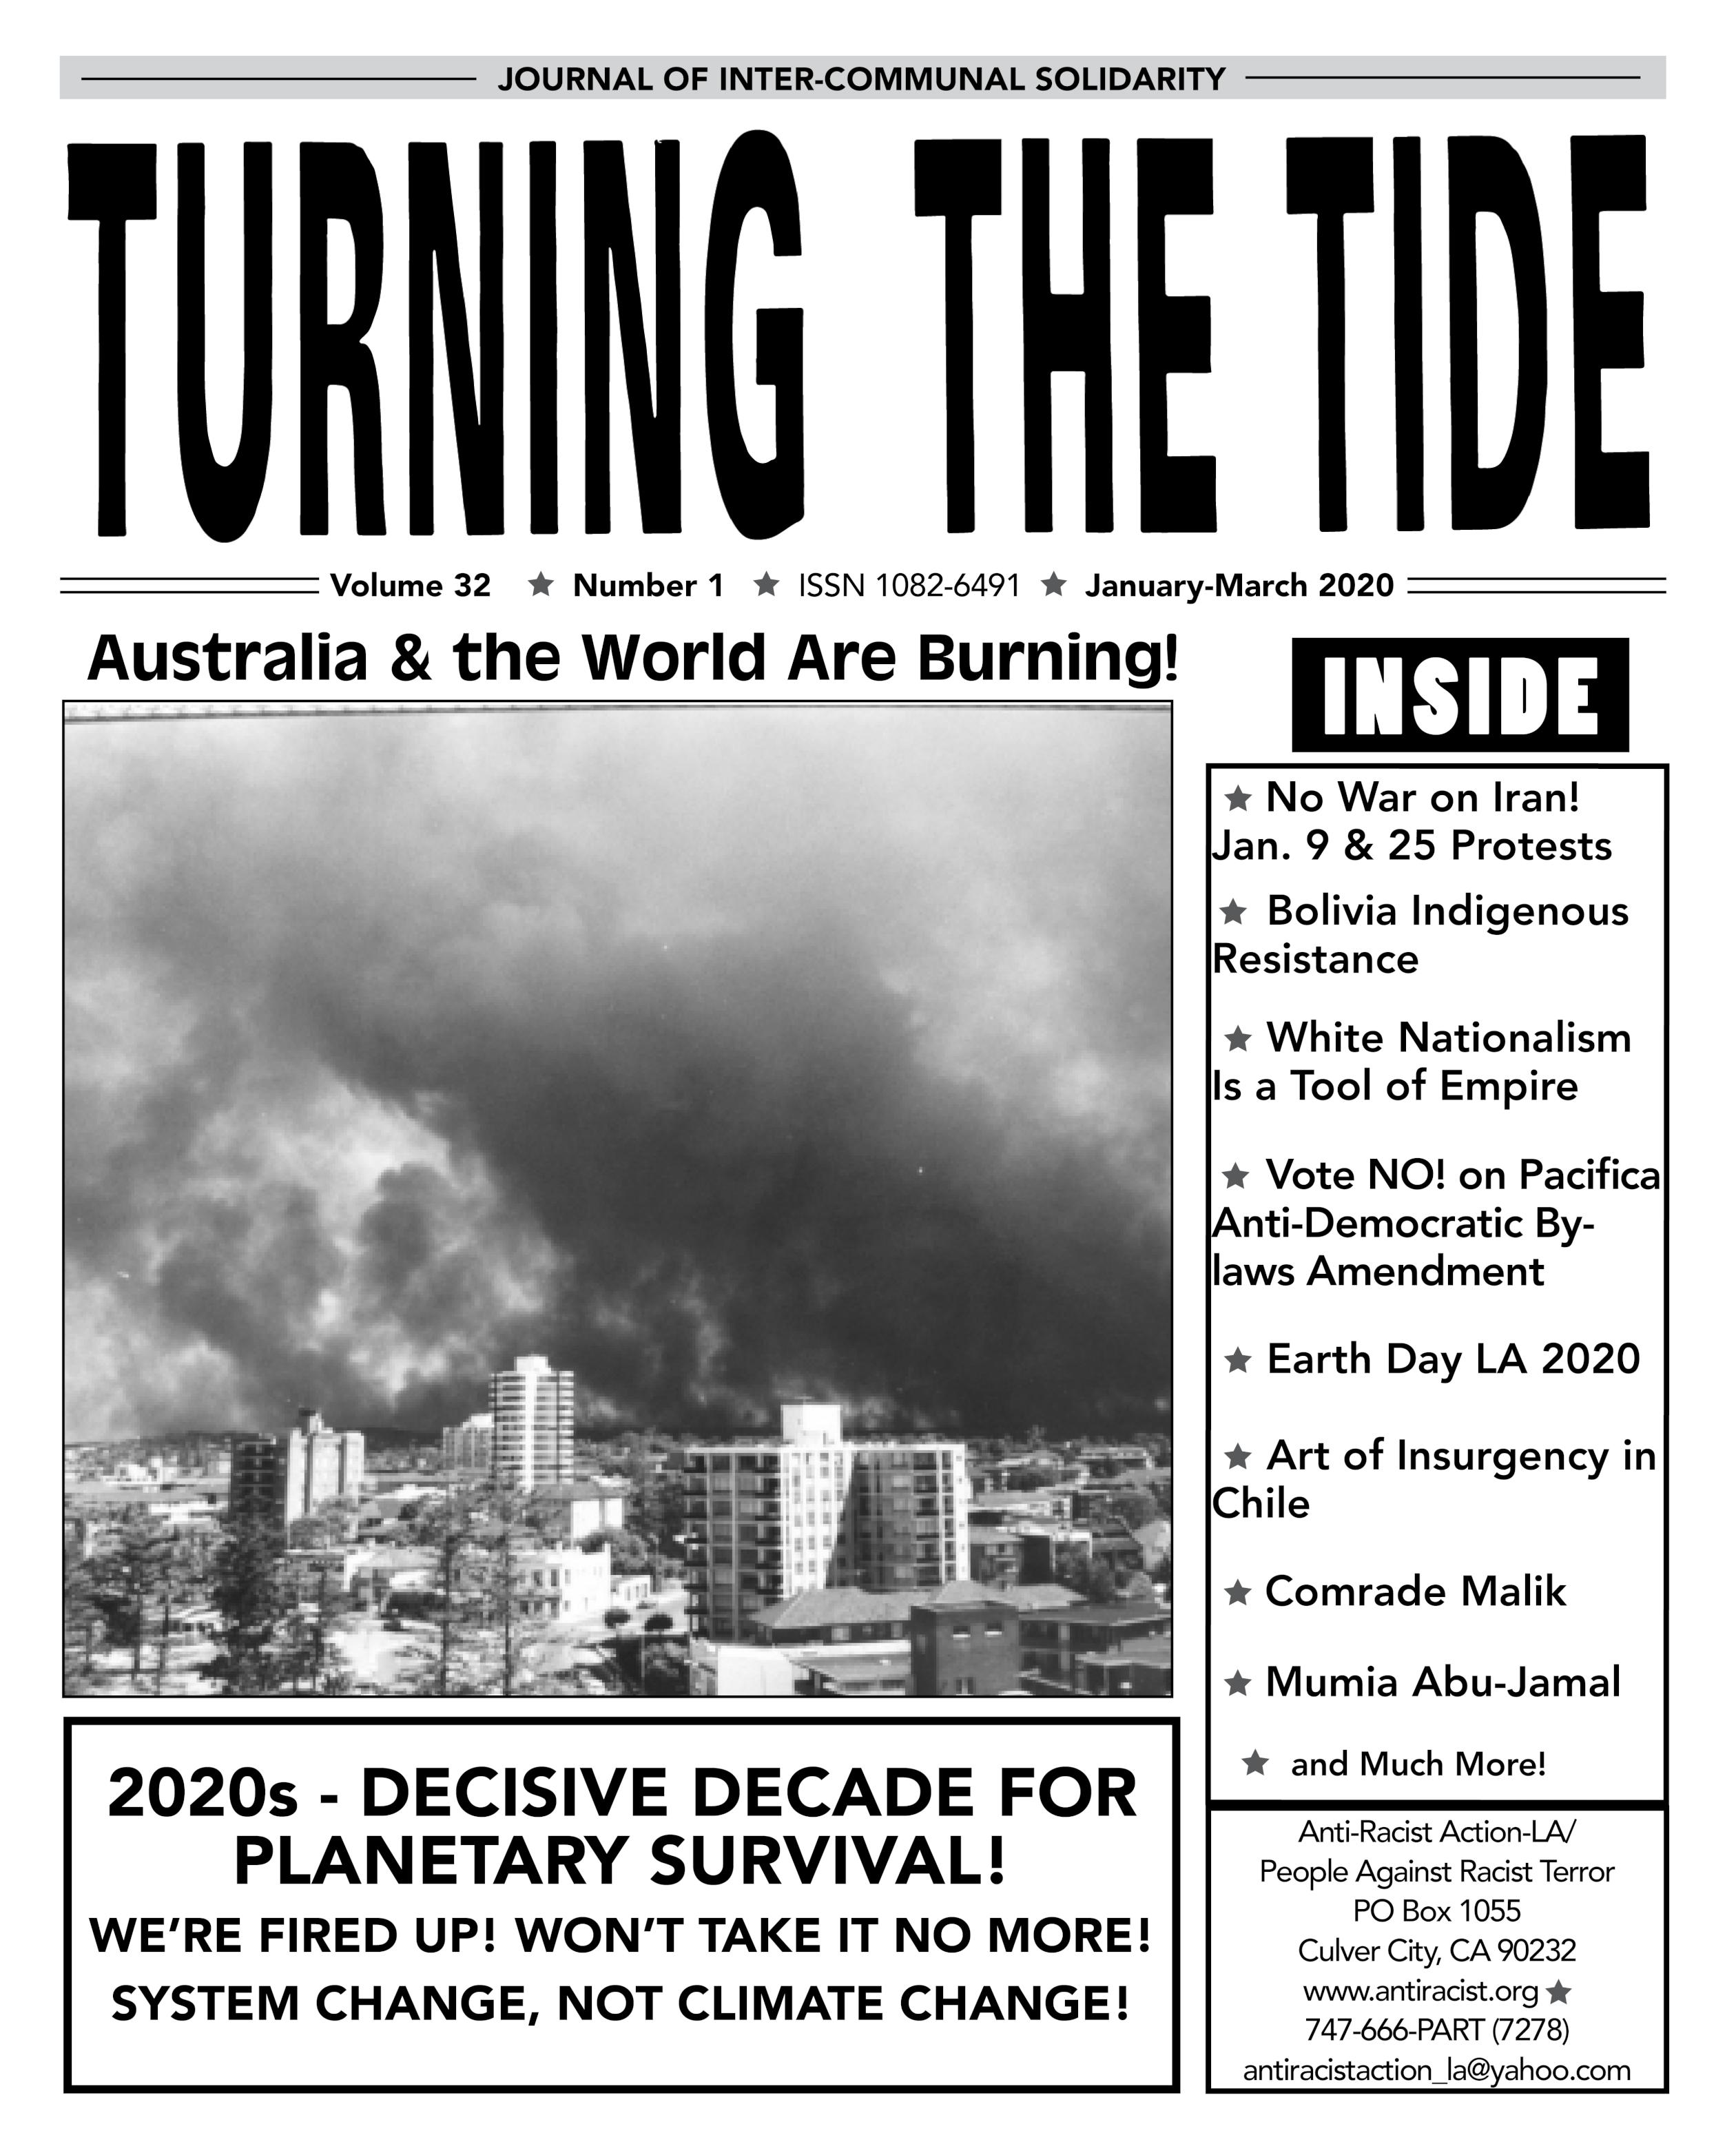 Vol. 32 #1 Jan-March 2020